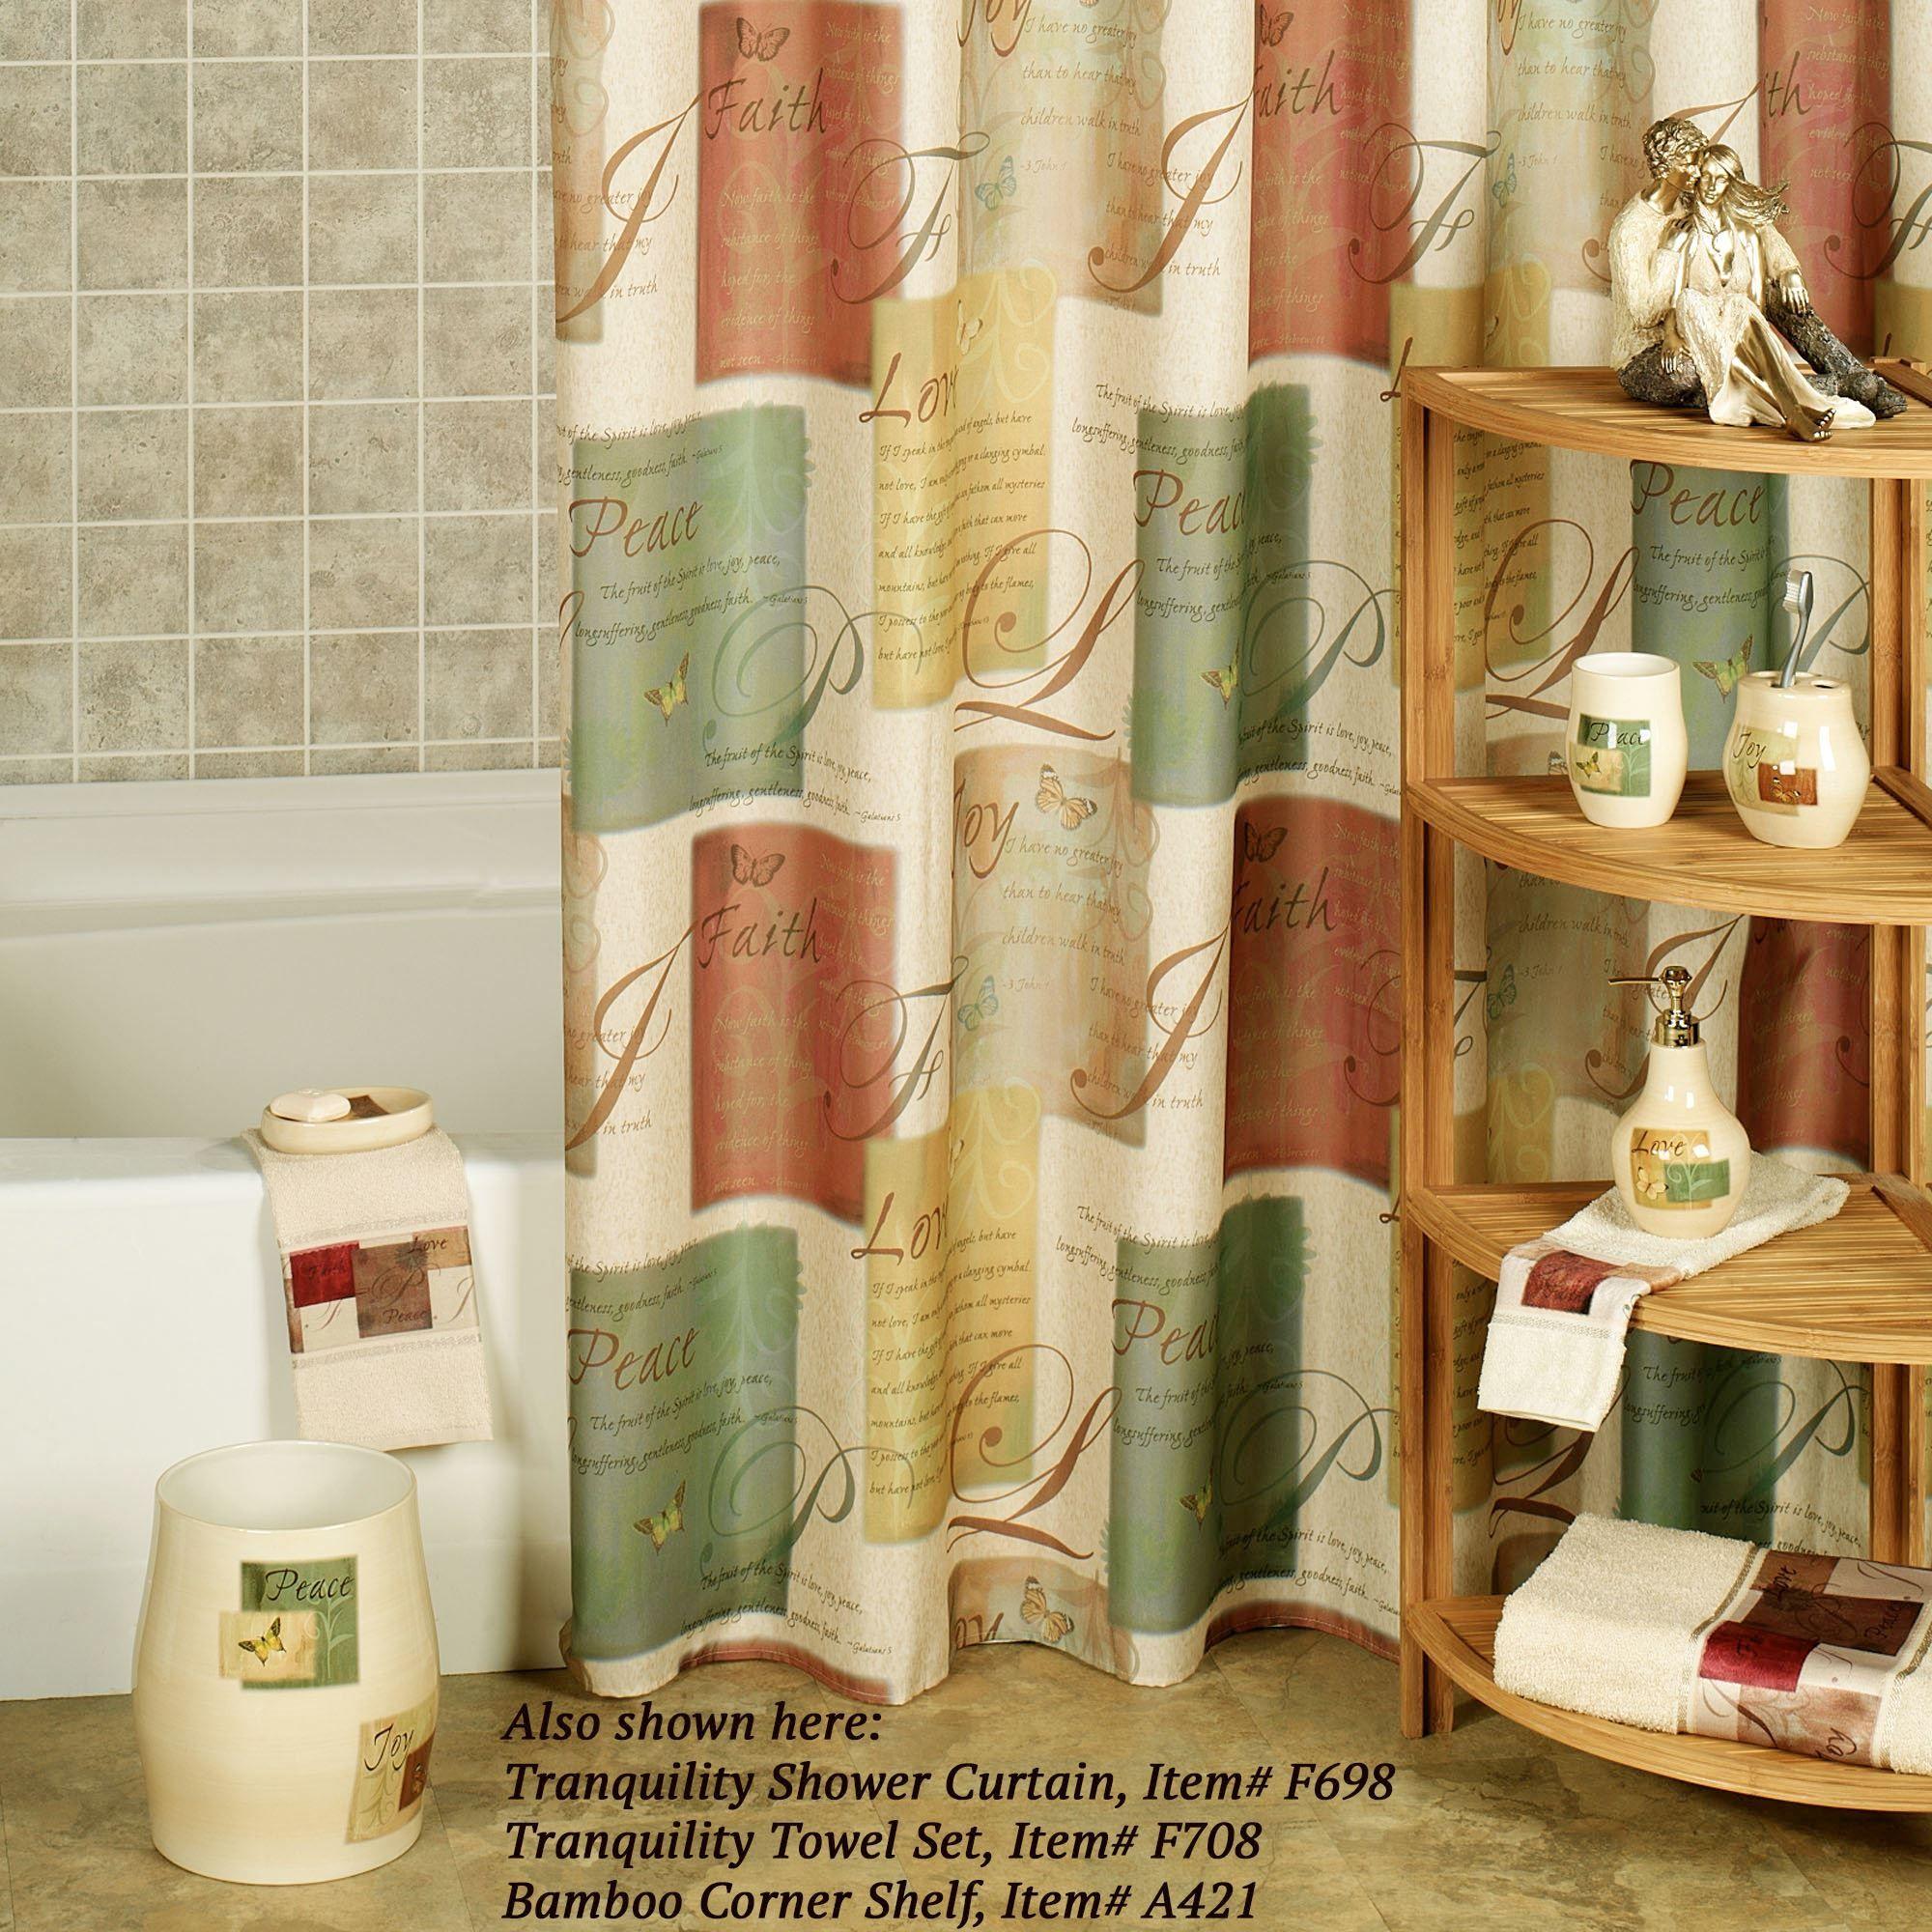 Tranquility Lotion Soap Dispenser Beige